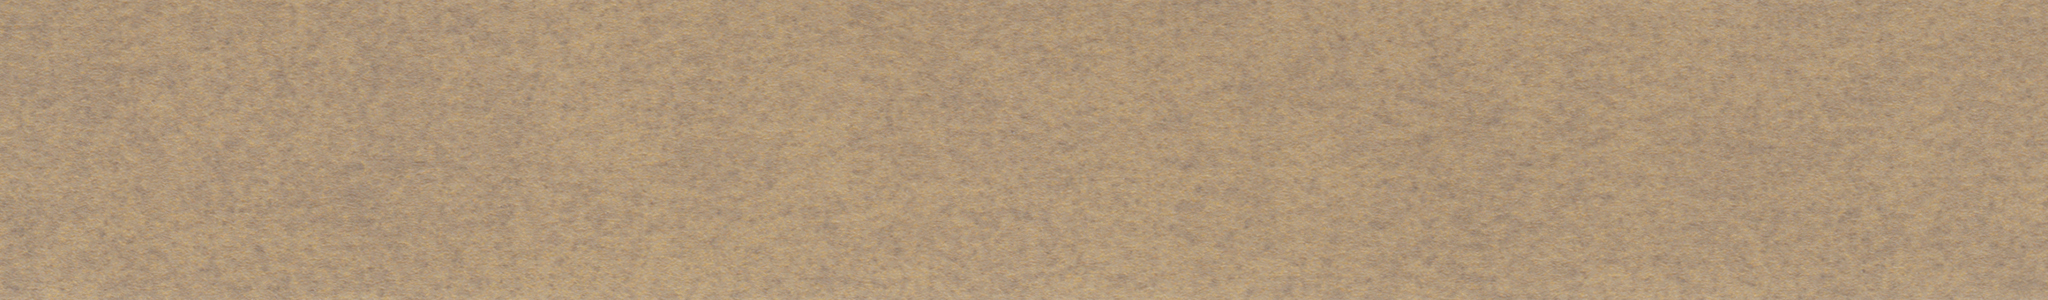 HD 296110 ABS Edge Kito Bronze Pearl  Softmatt